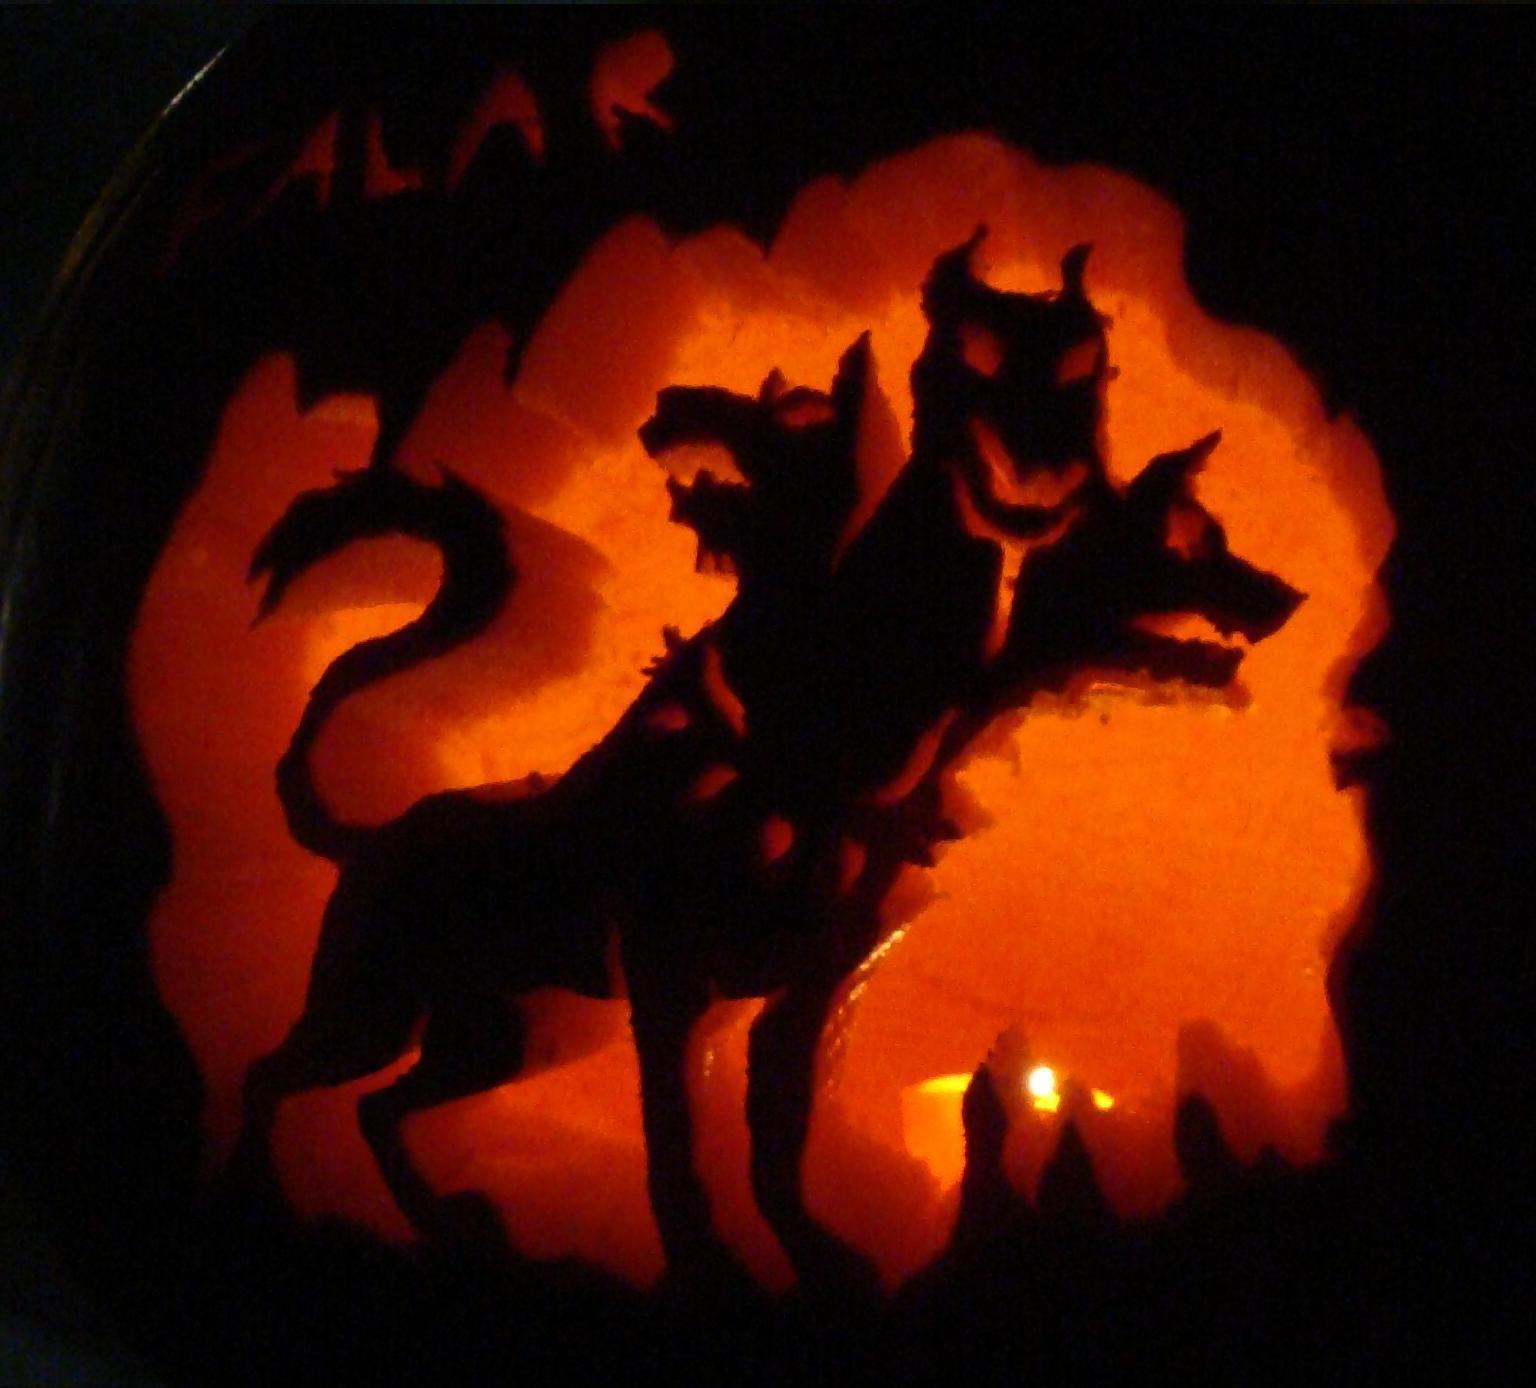 Halloween pumpkin (photo)